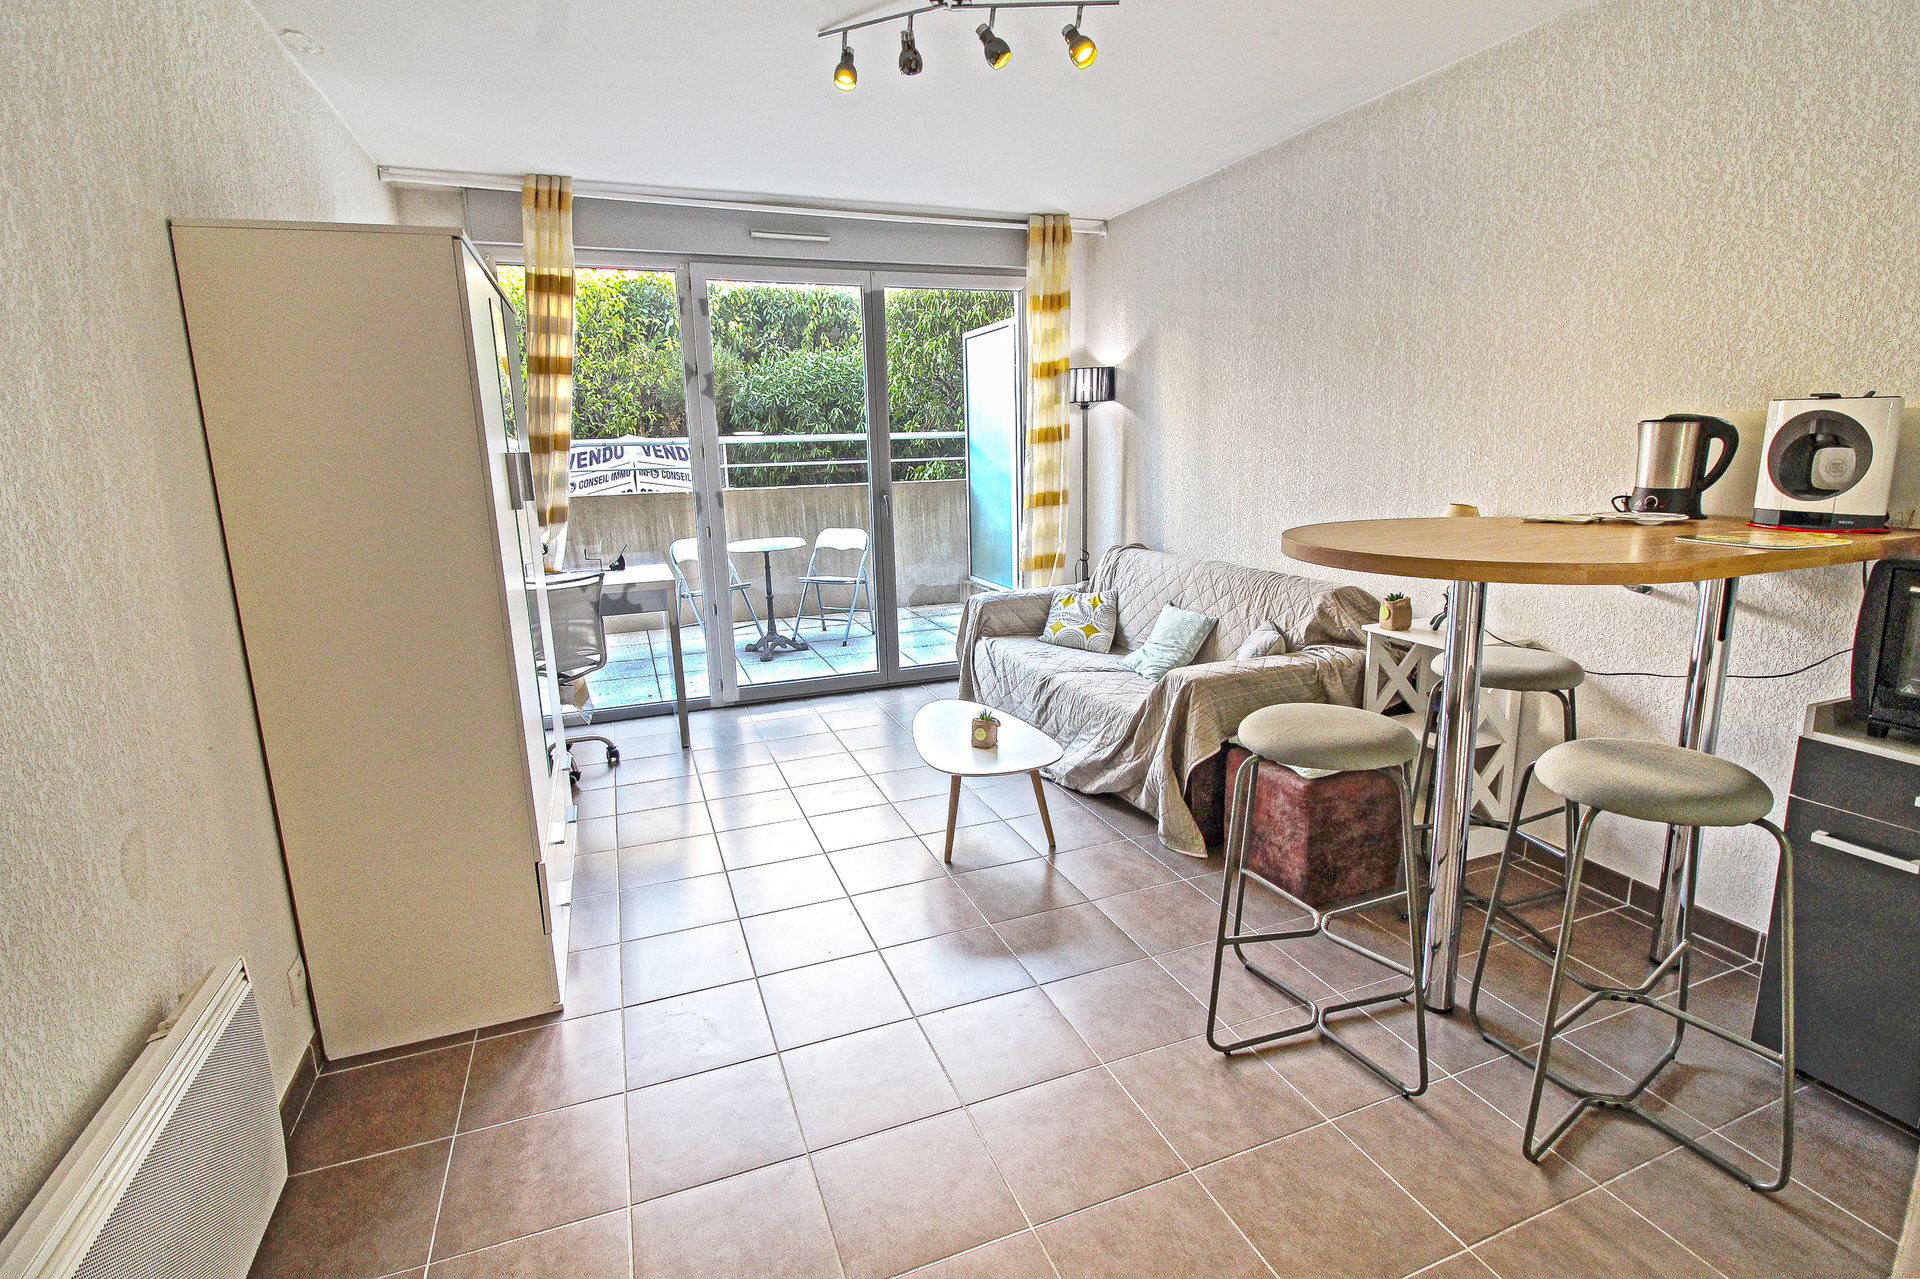 RIQUIER - STUDIO Neuf - Terrasse - Calme / vue Jardin - 140.000 €